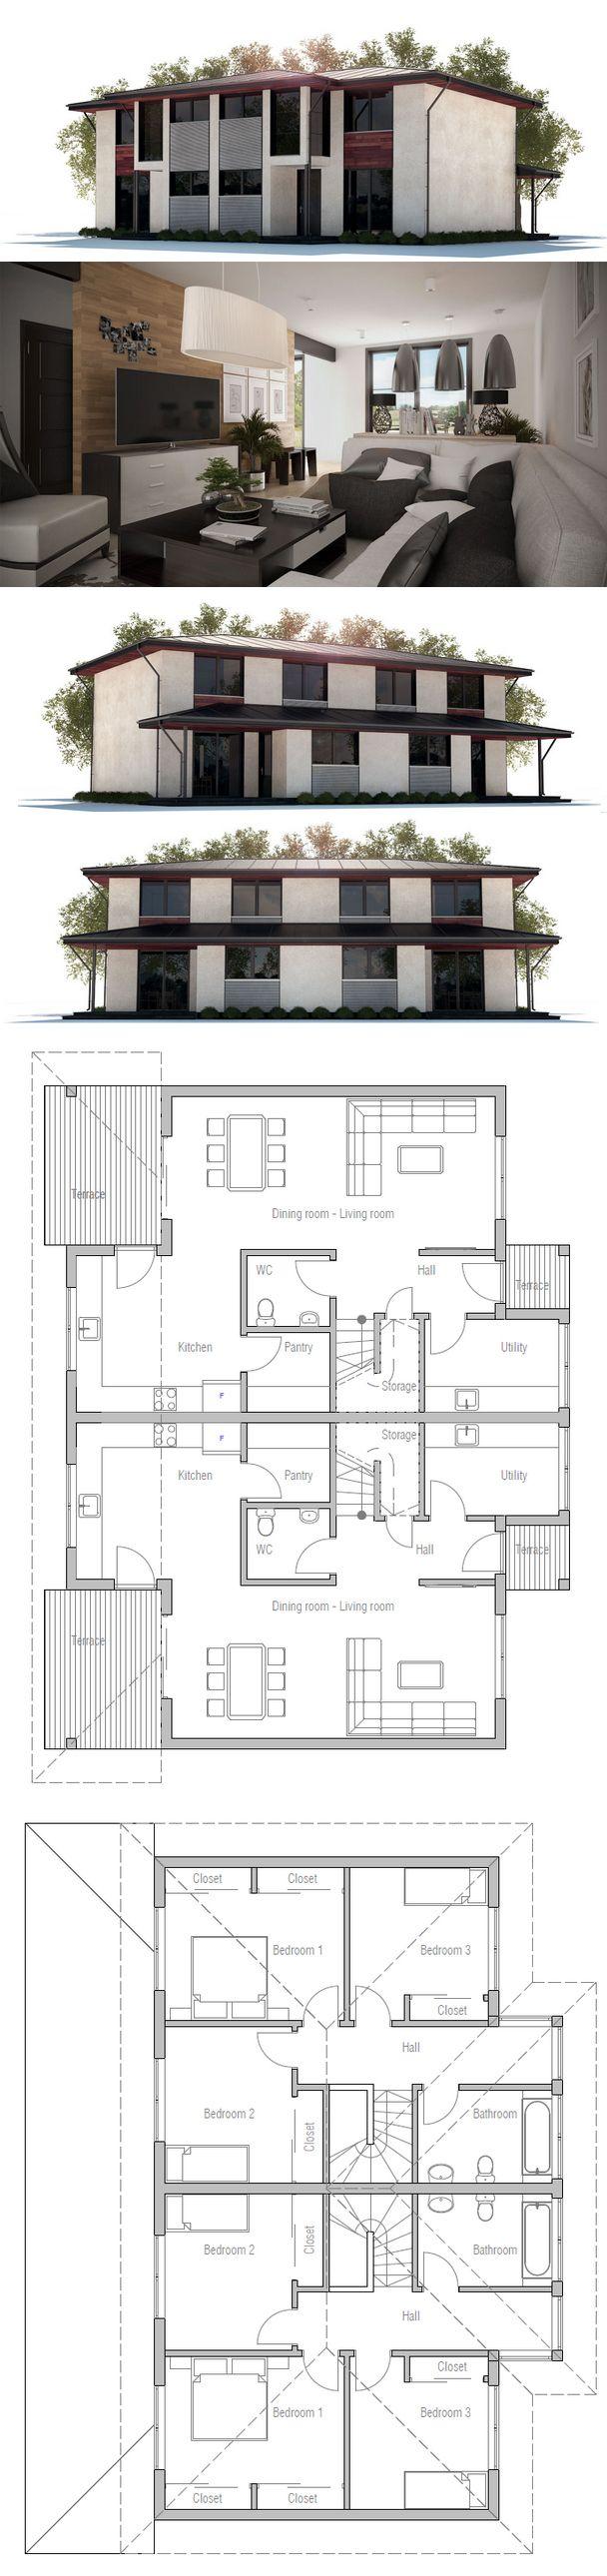 82 best duplex fourplex plans images on pinterest for Plan maison duplex moderne